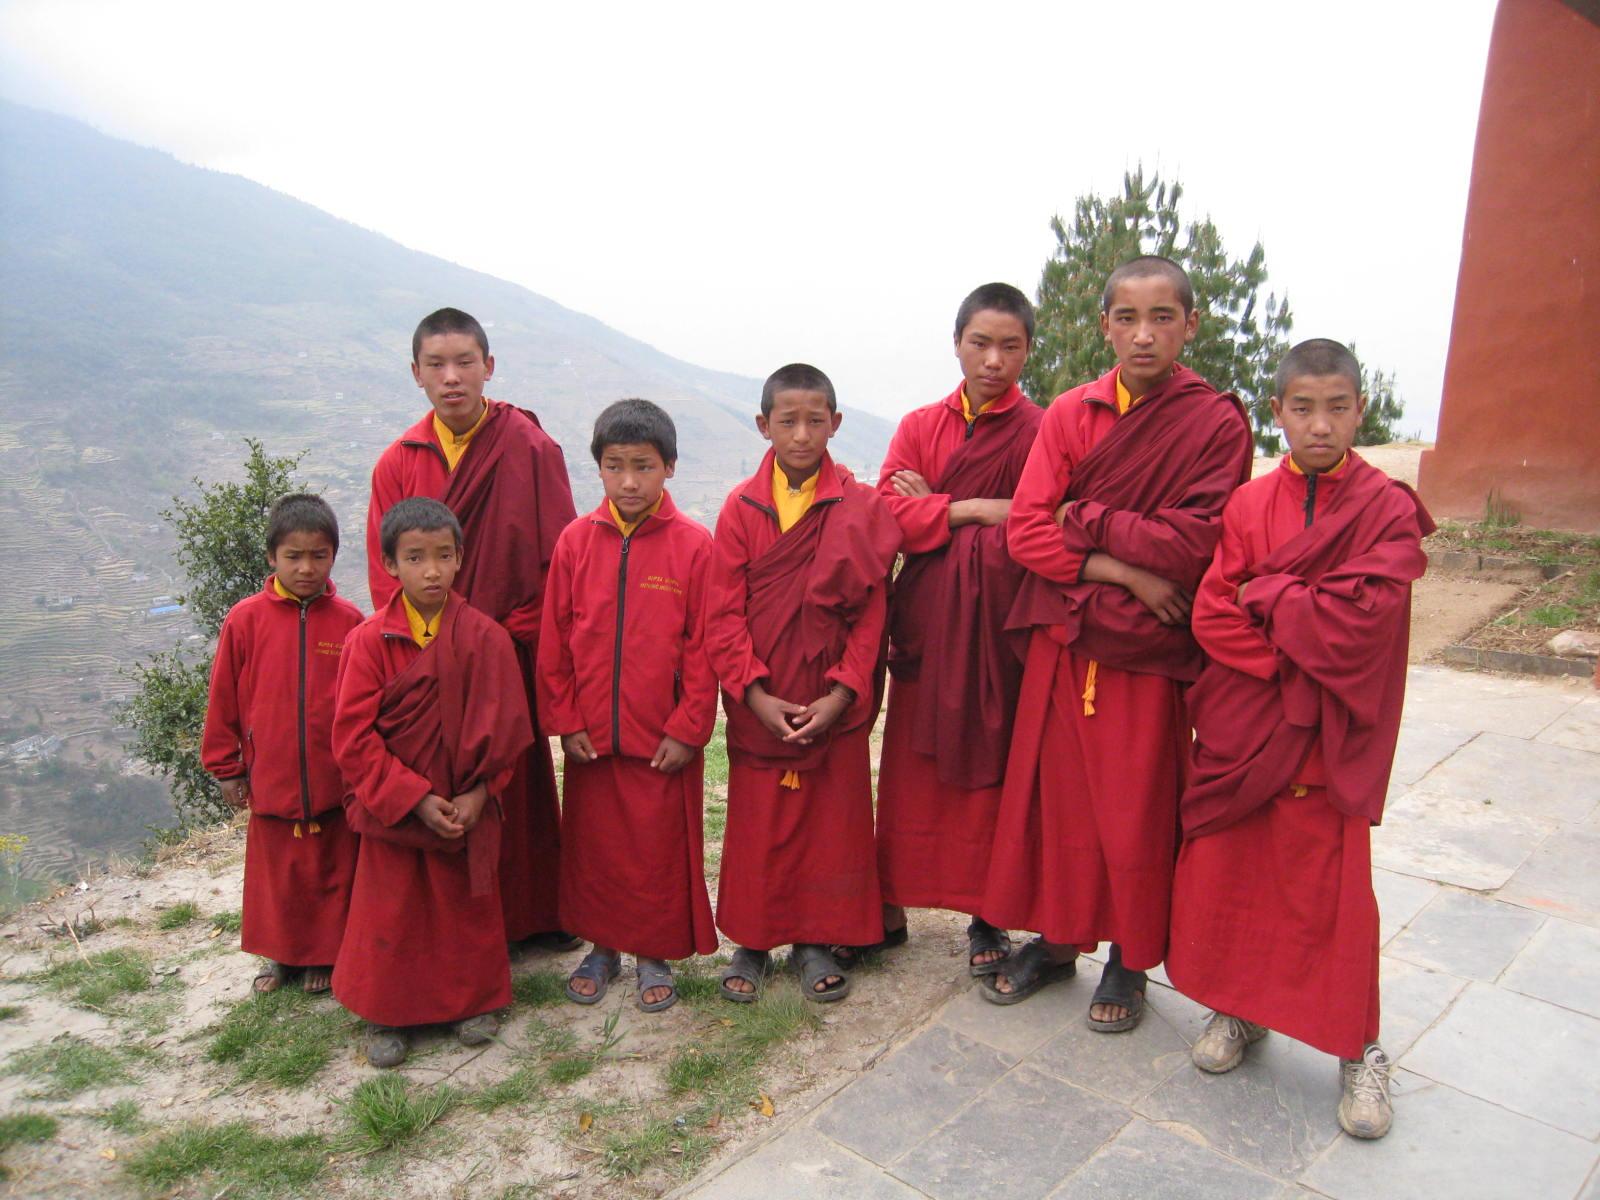 Monk disciples